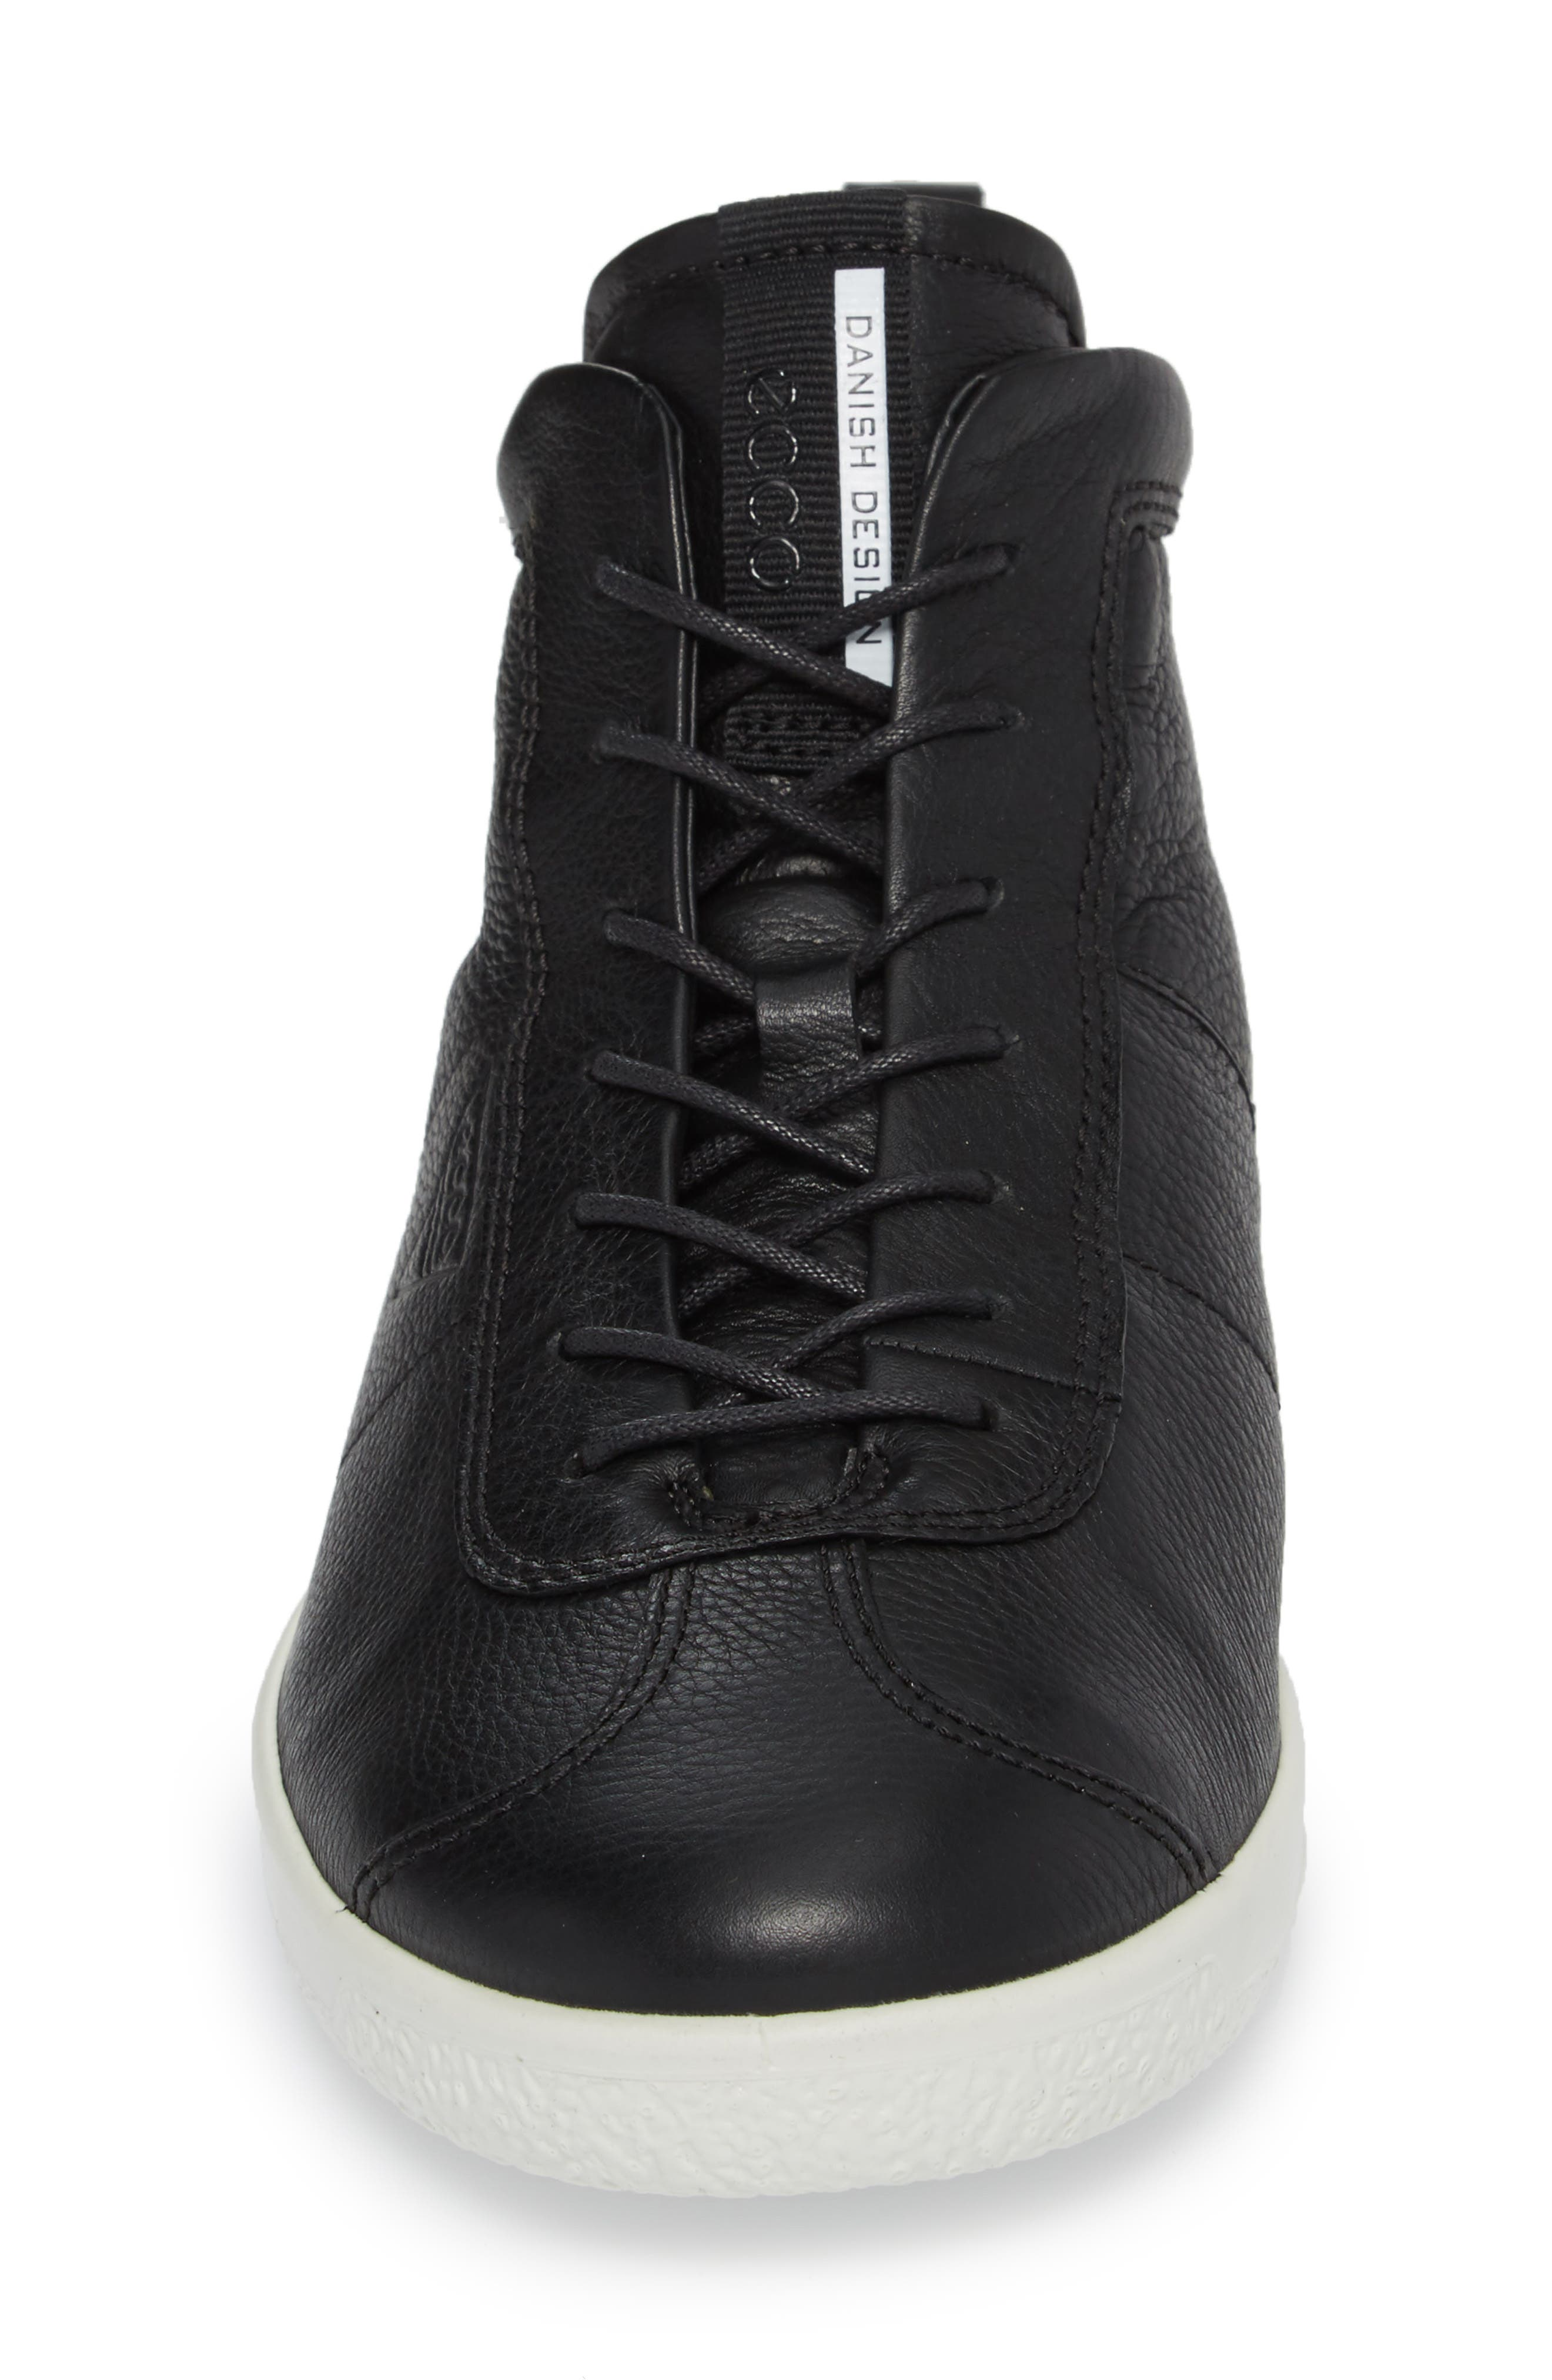 Soft 1 High Top Sneaker,                             Alternate thumbnail 4, color,                             009